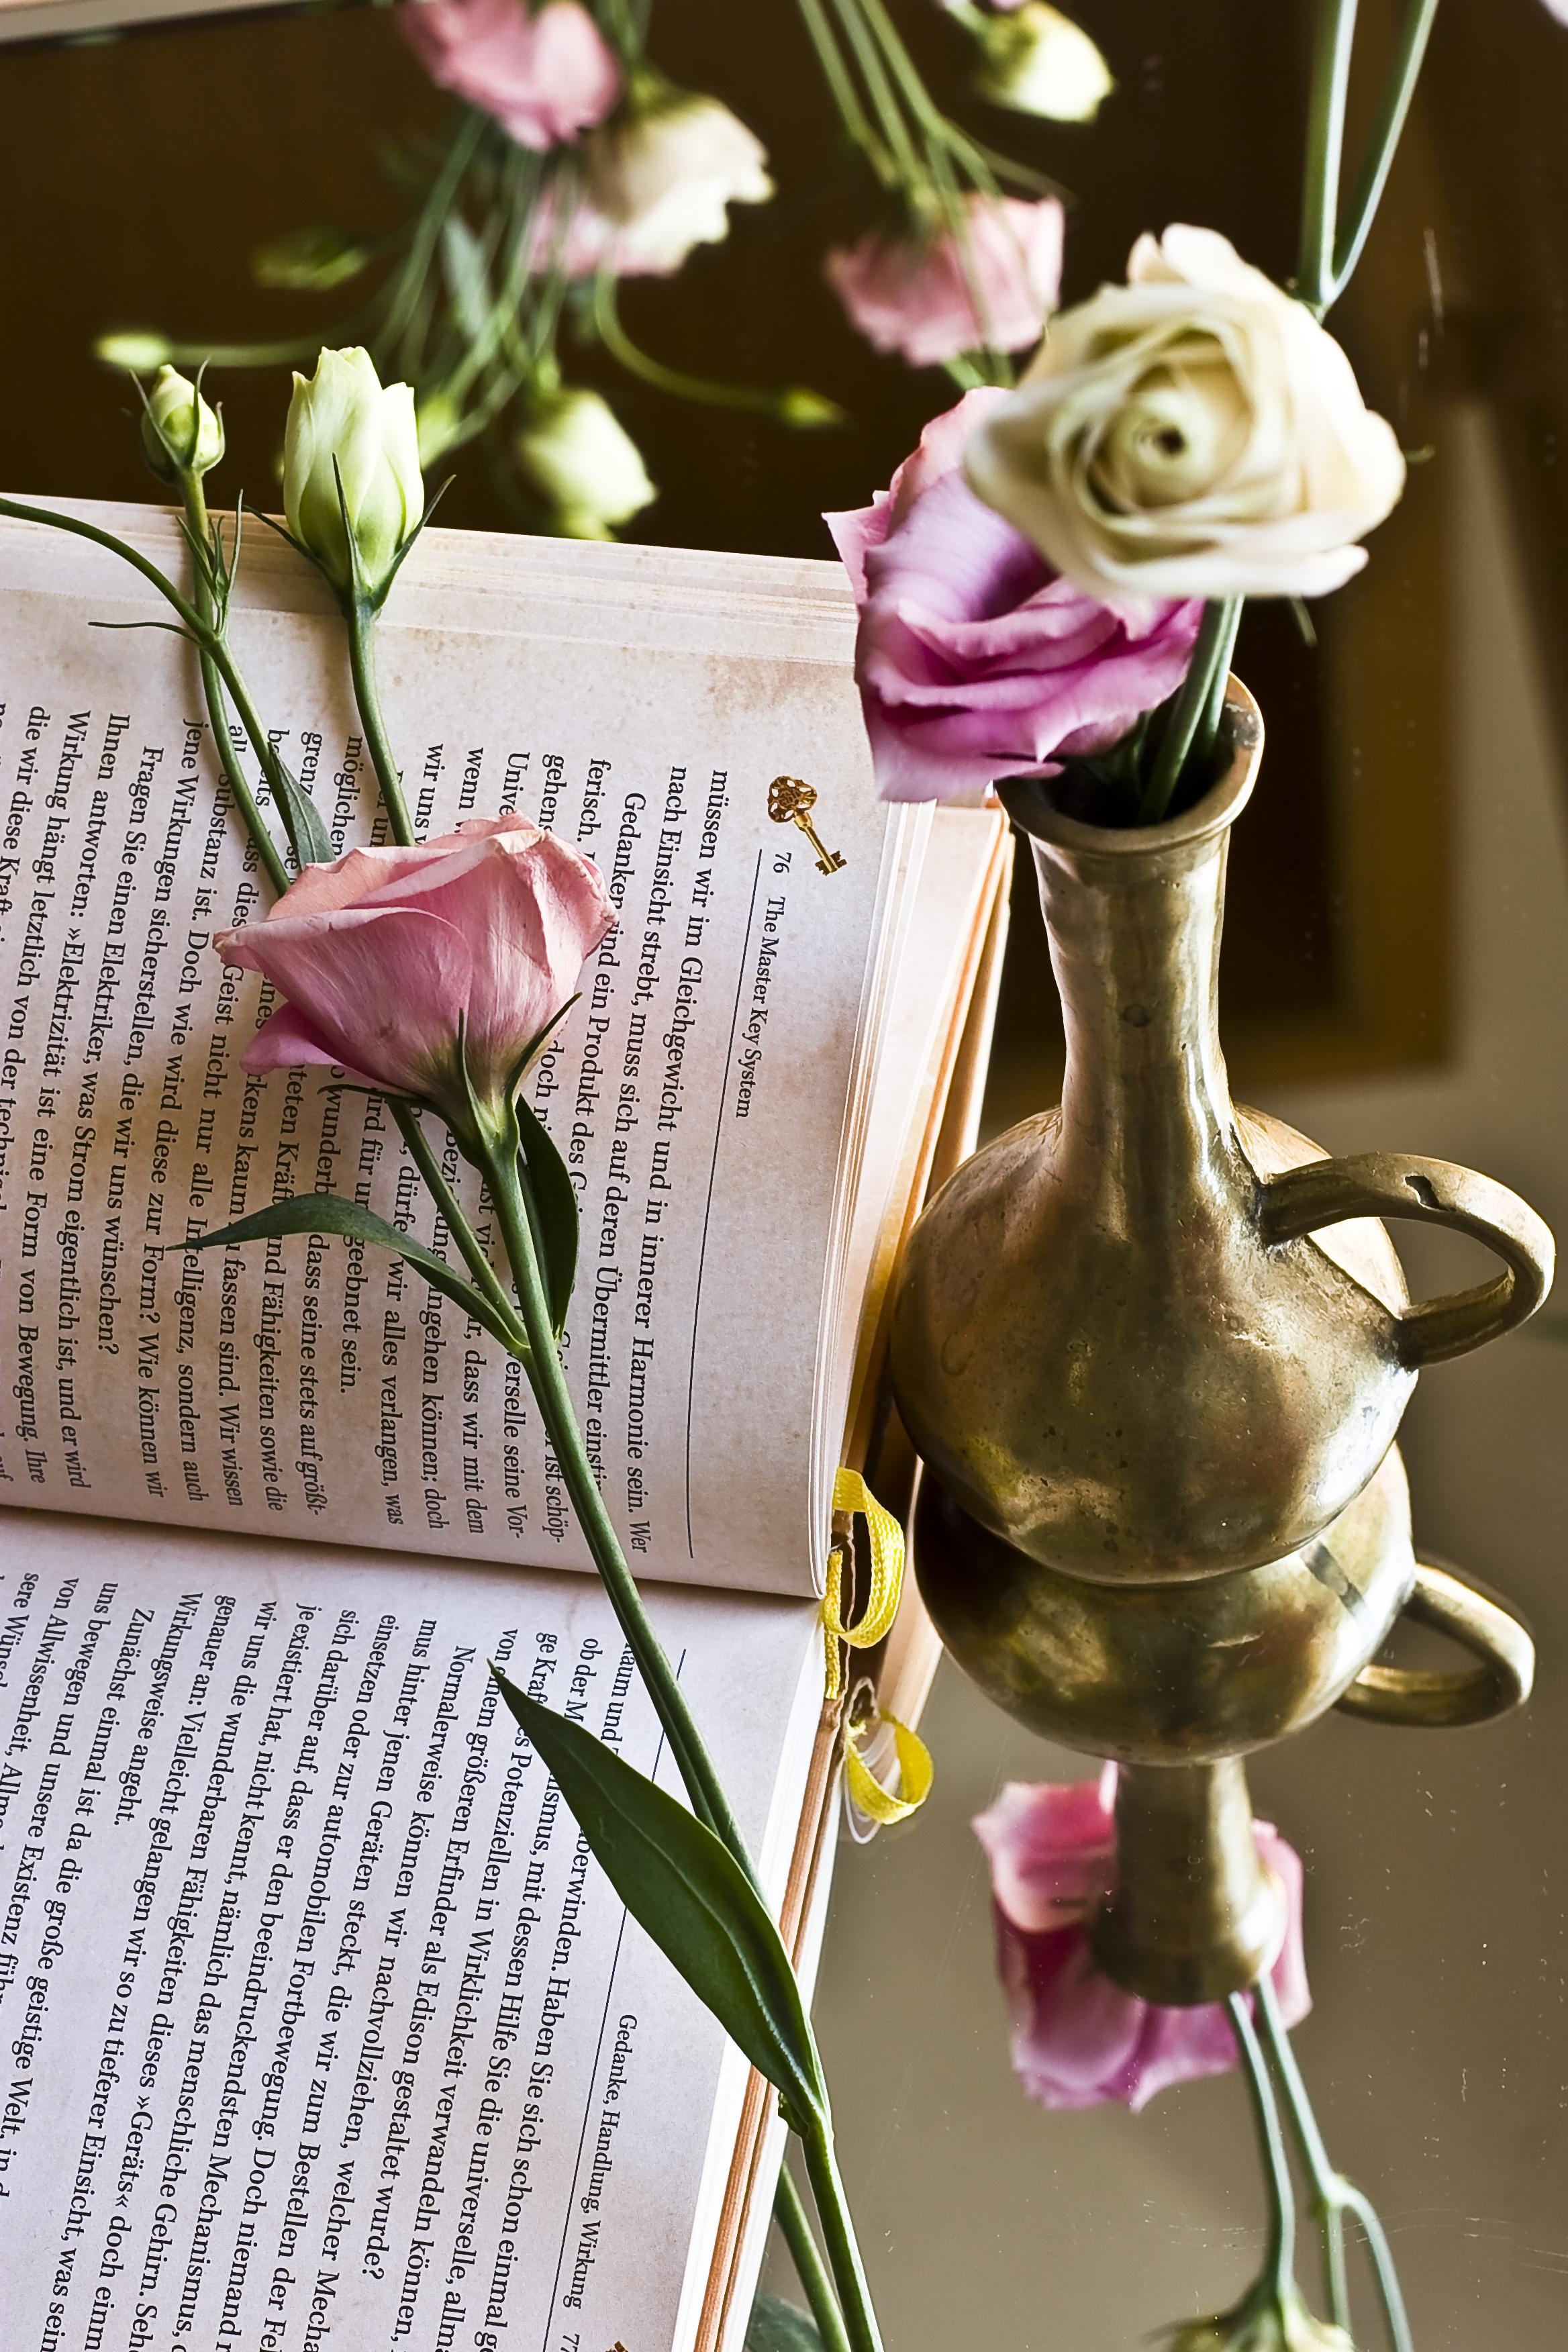 Free Images Blossom Book Novel Read Plant Purple Bloom Vase